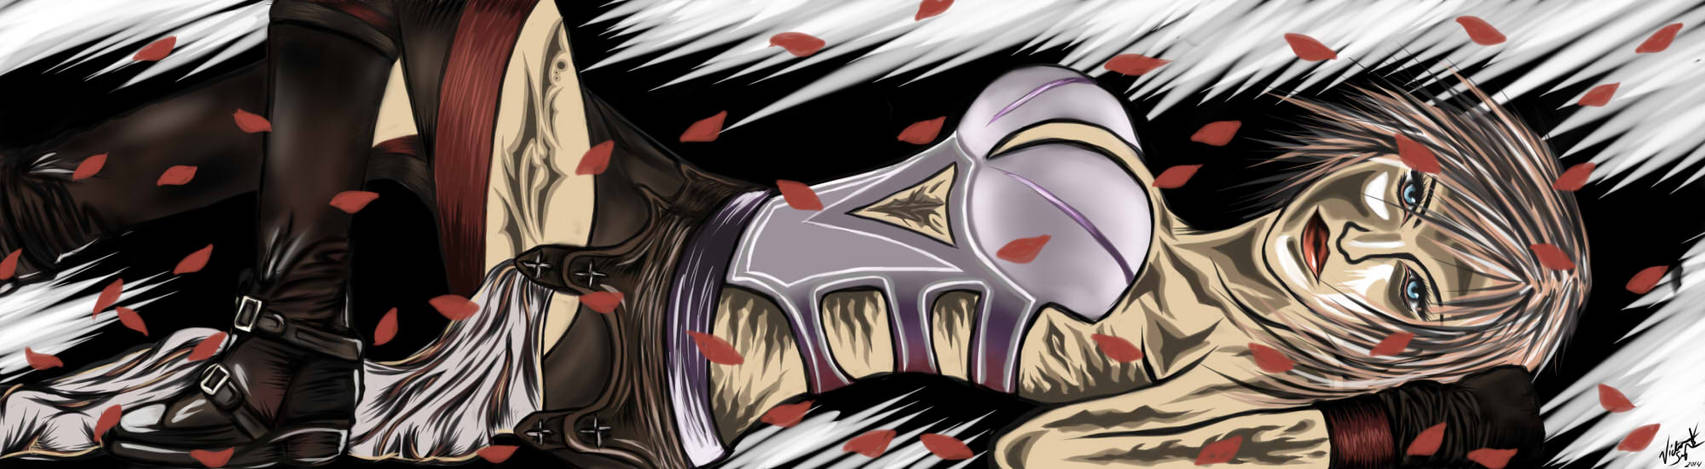 Lightning Returns - FFXIII